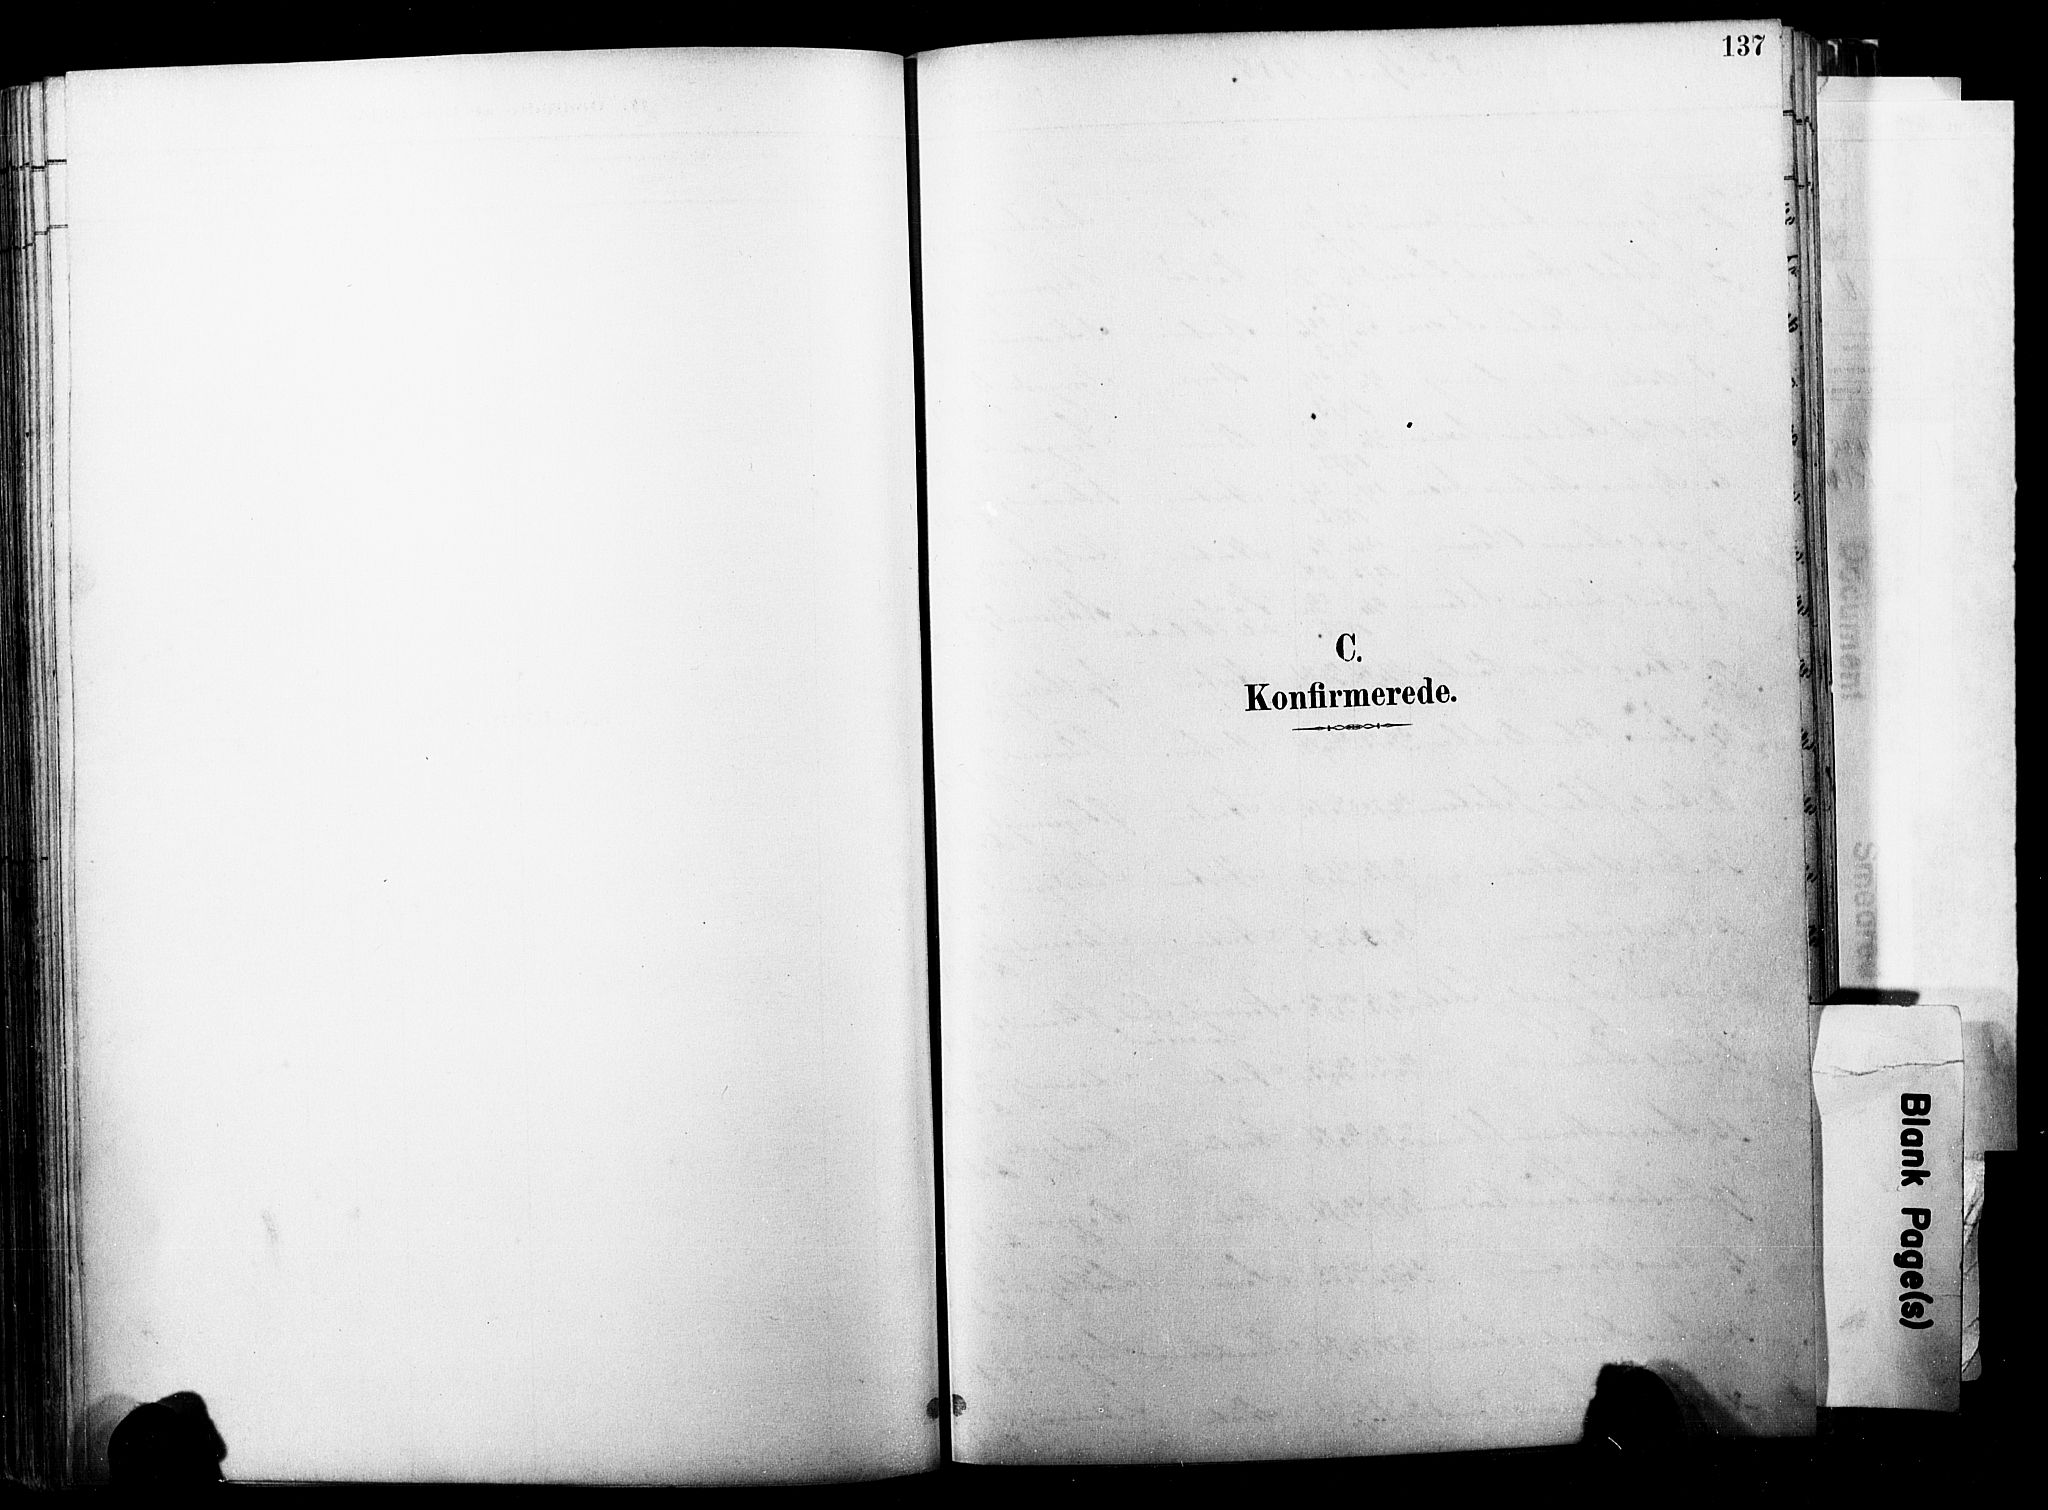 SAKO, Horten kirkebøker, F/Fa/L0004: Parish register (official) no. 4, 1888-1895, p. 137